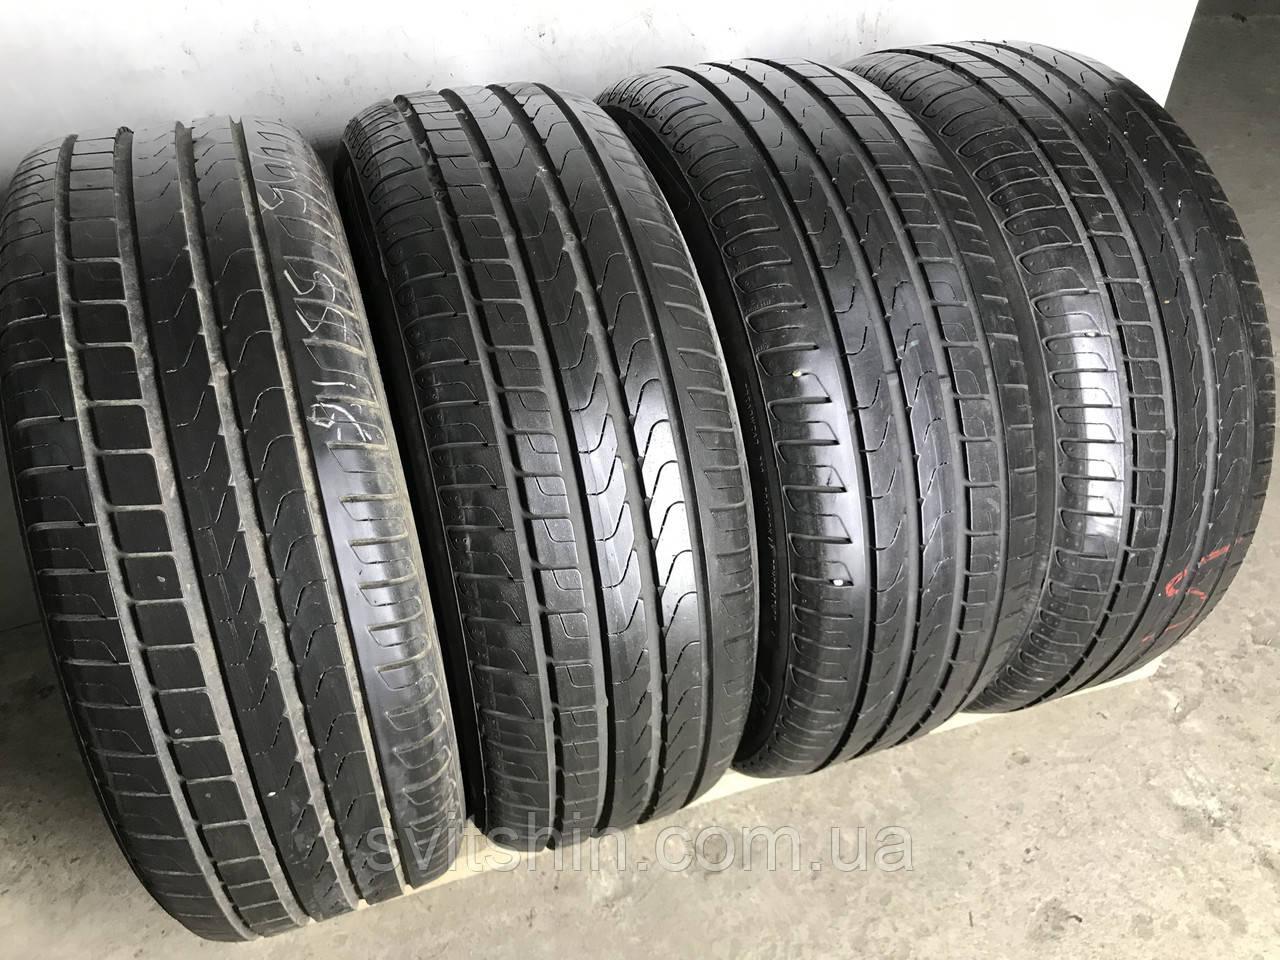 Шины бу летние 205/55R16 Pirelli Cinturato P7 (6,5-7мм) 4шт